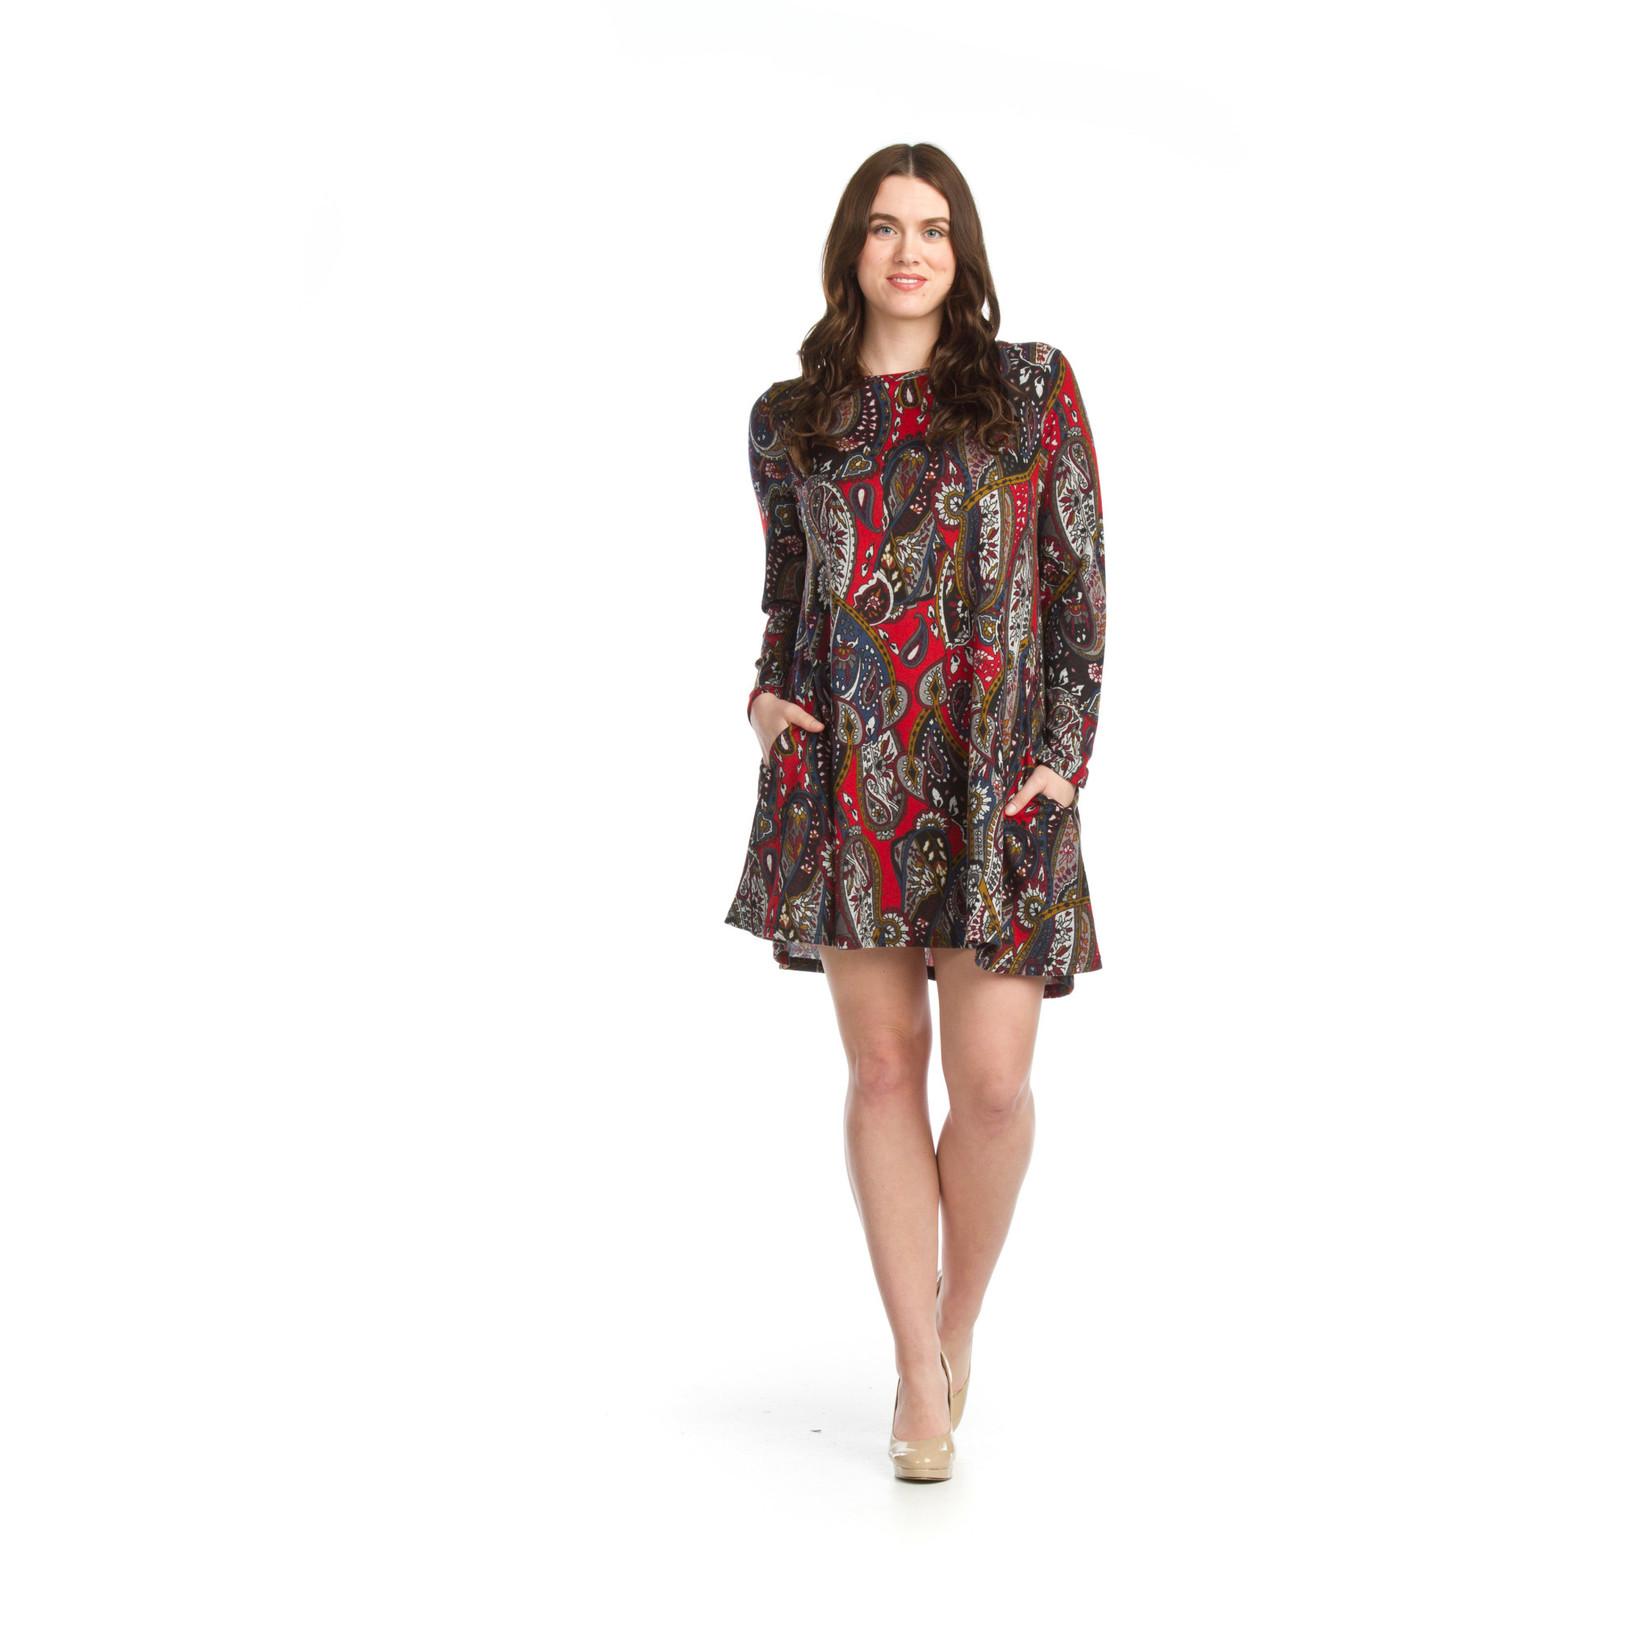 Papillon Paisley Knit A-line Sweater Dress